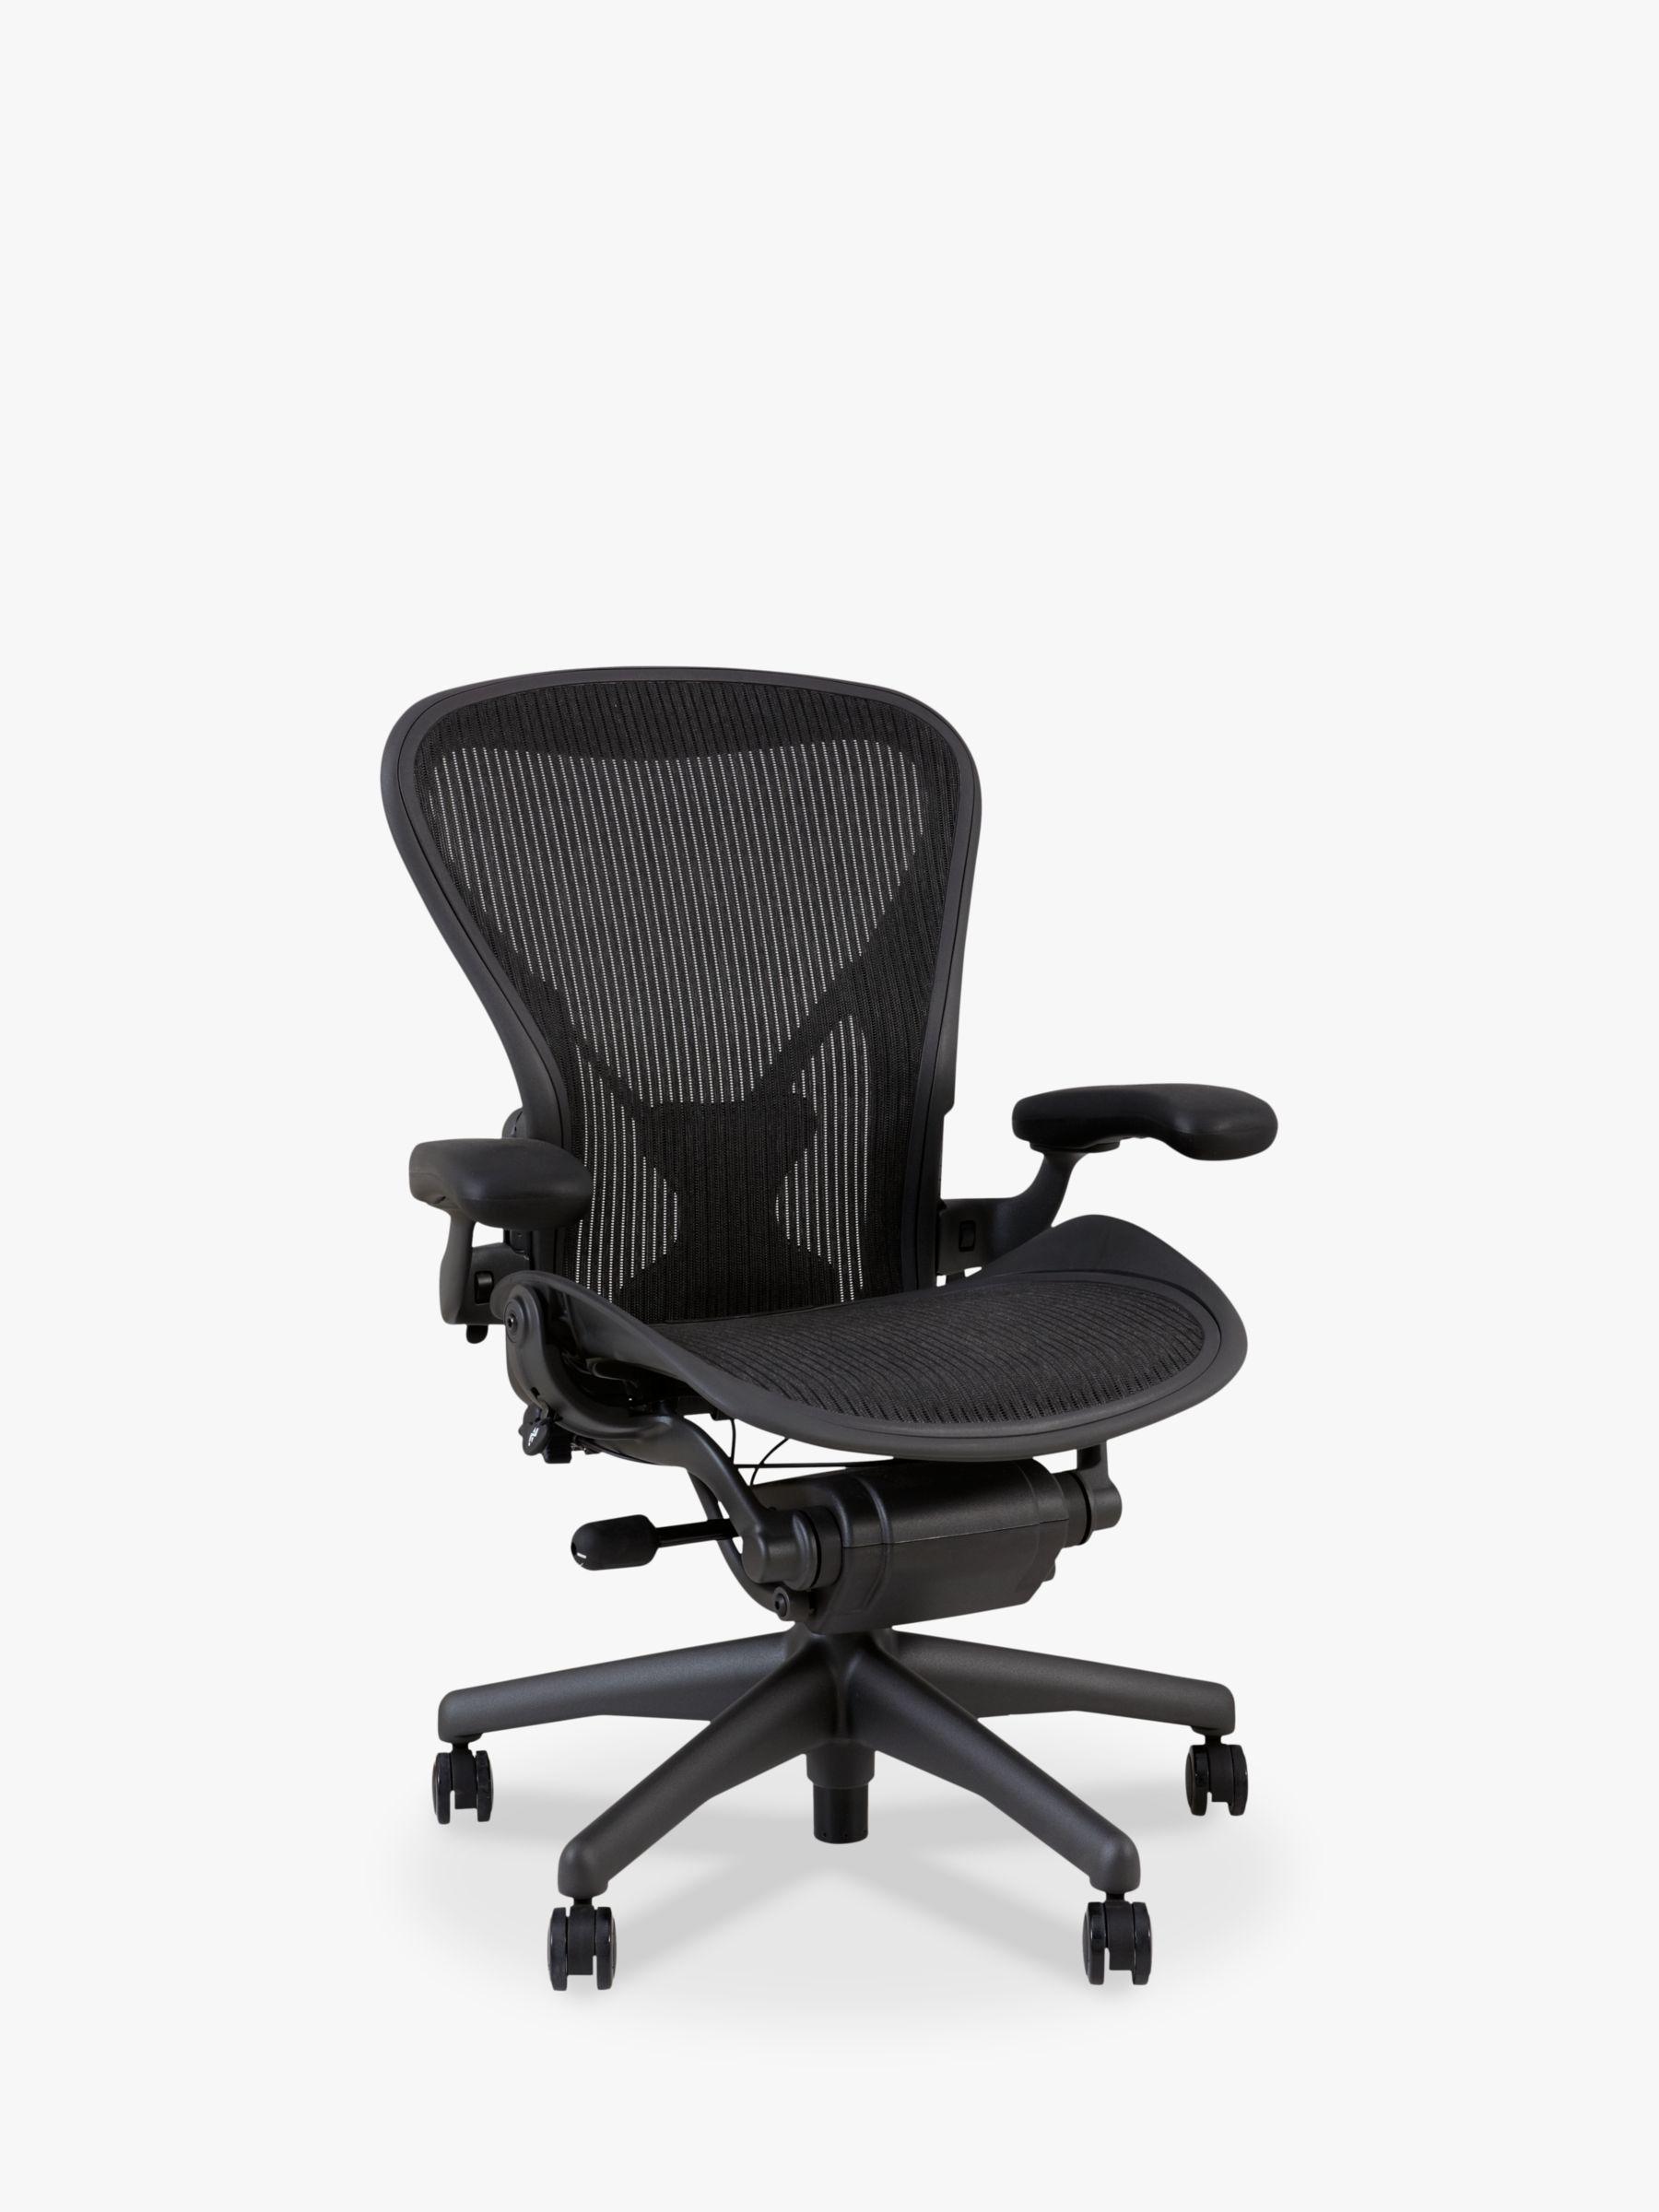 Buy Herman Miller Classic Aeron Office Chair John Lewis